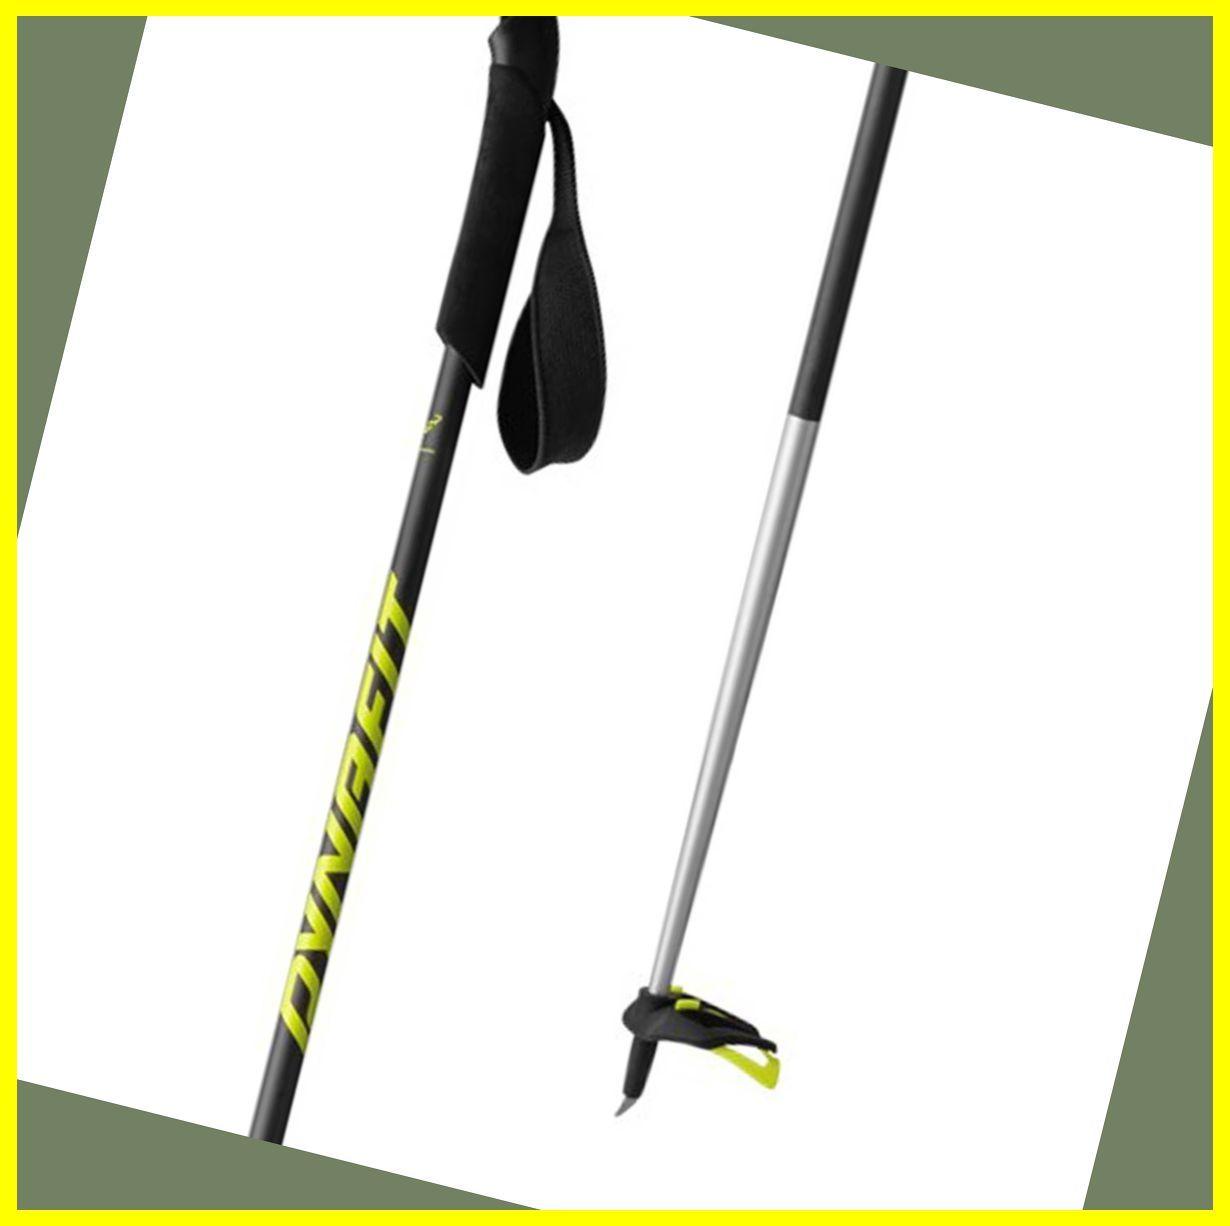 Speed Ski Poles Butterfly Golf Grip Golf Grip Hands The Golf Grip Training Aid 9 Fing In 2020 Golf Grip Golf Golf Tips For Beginners